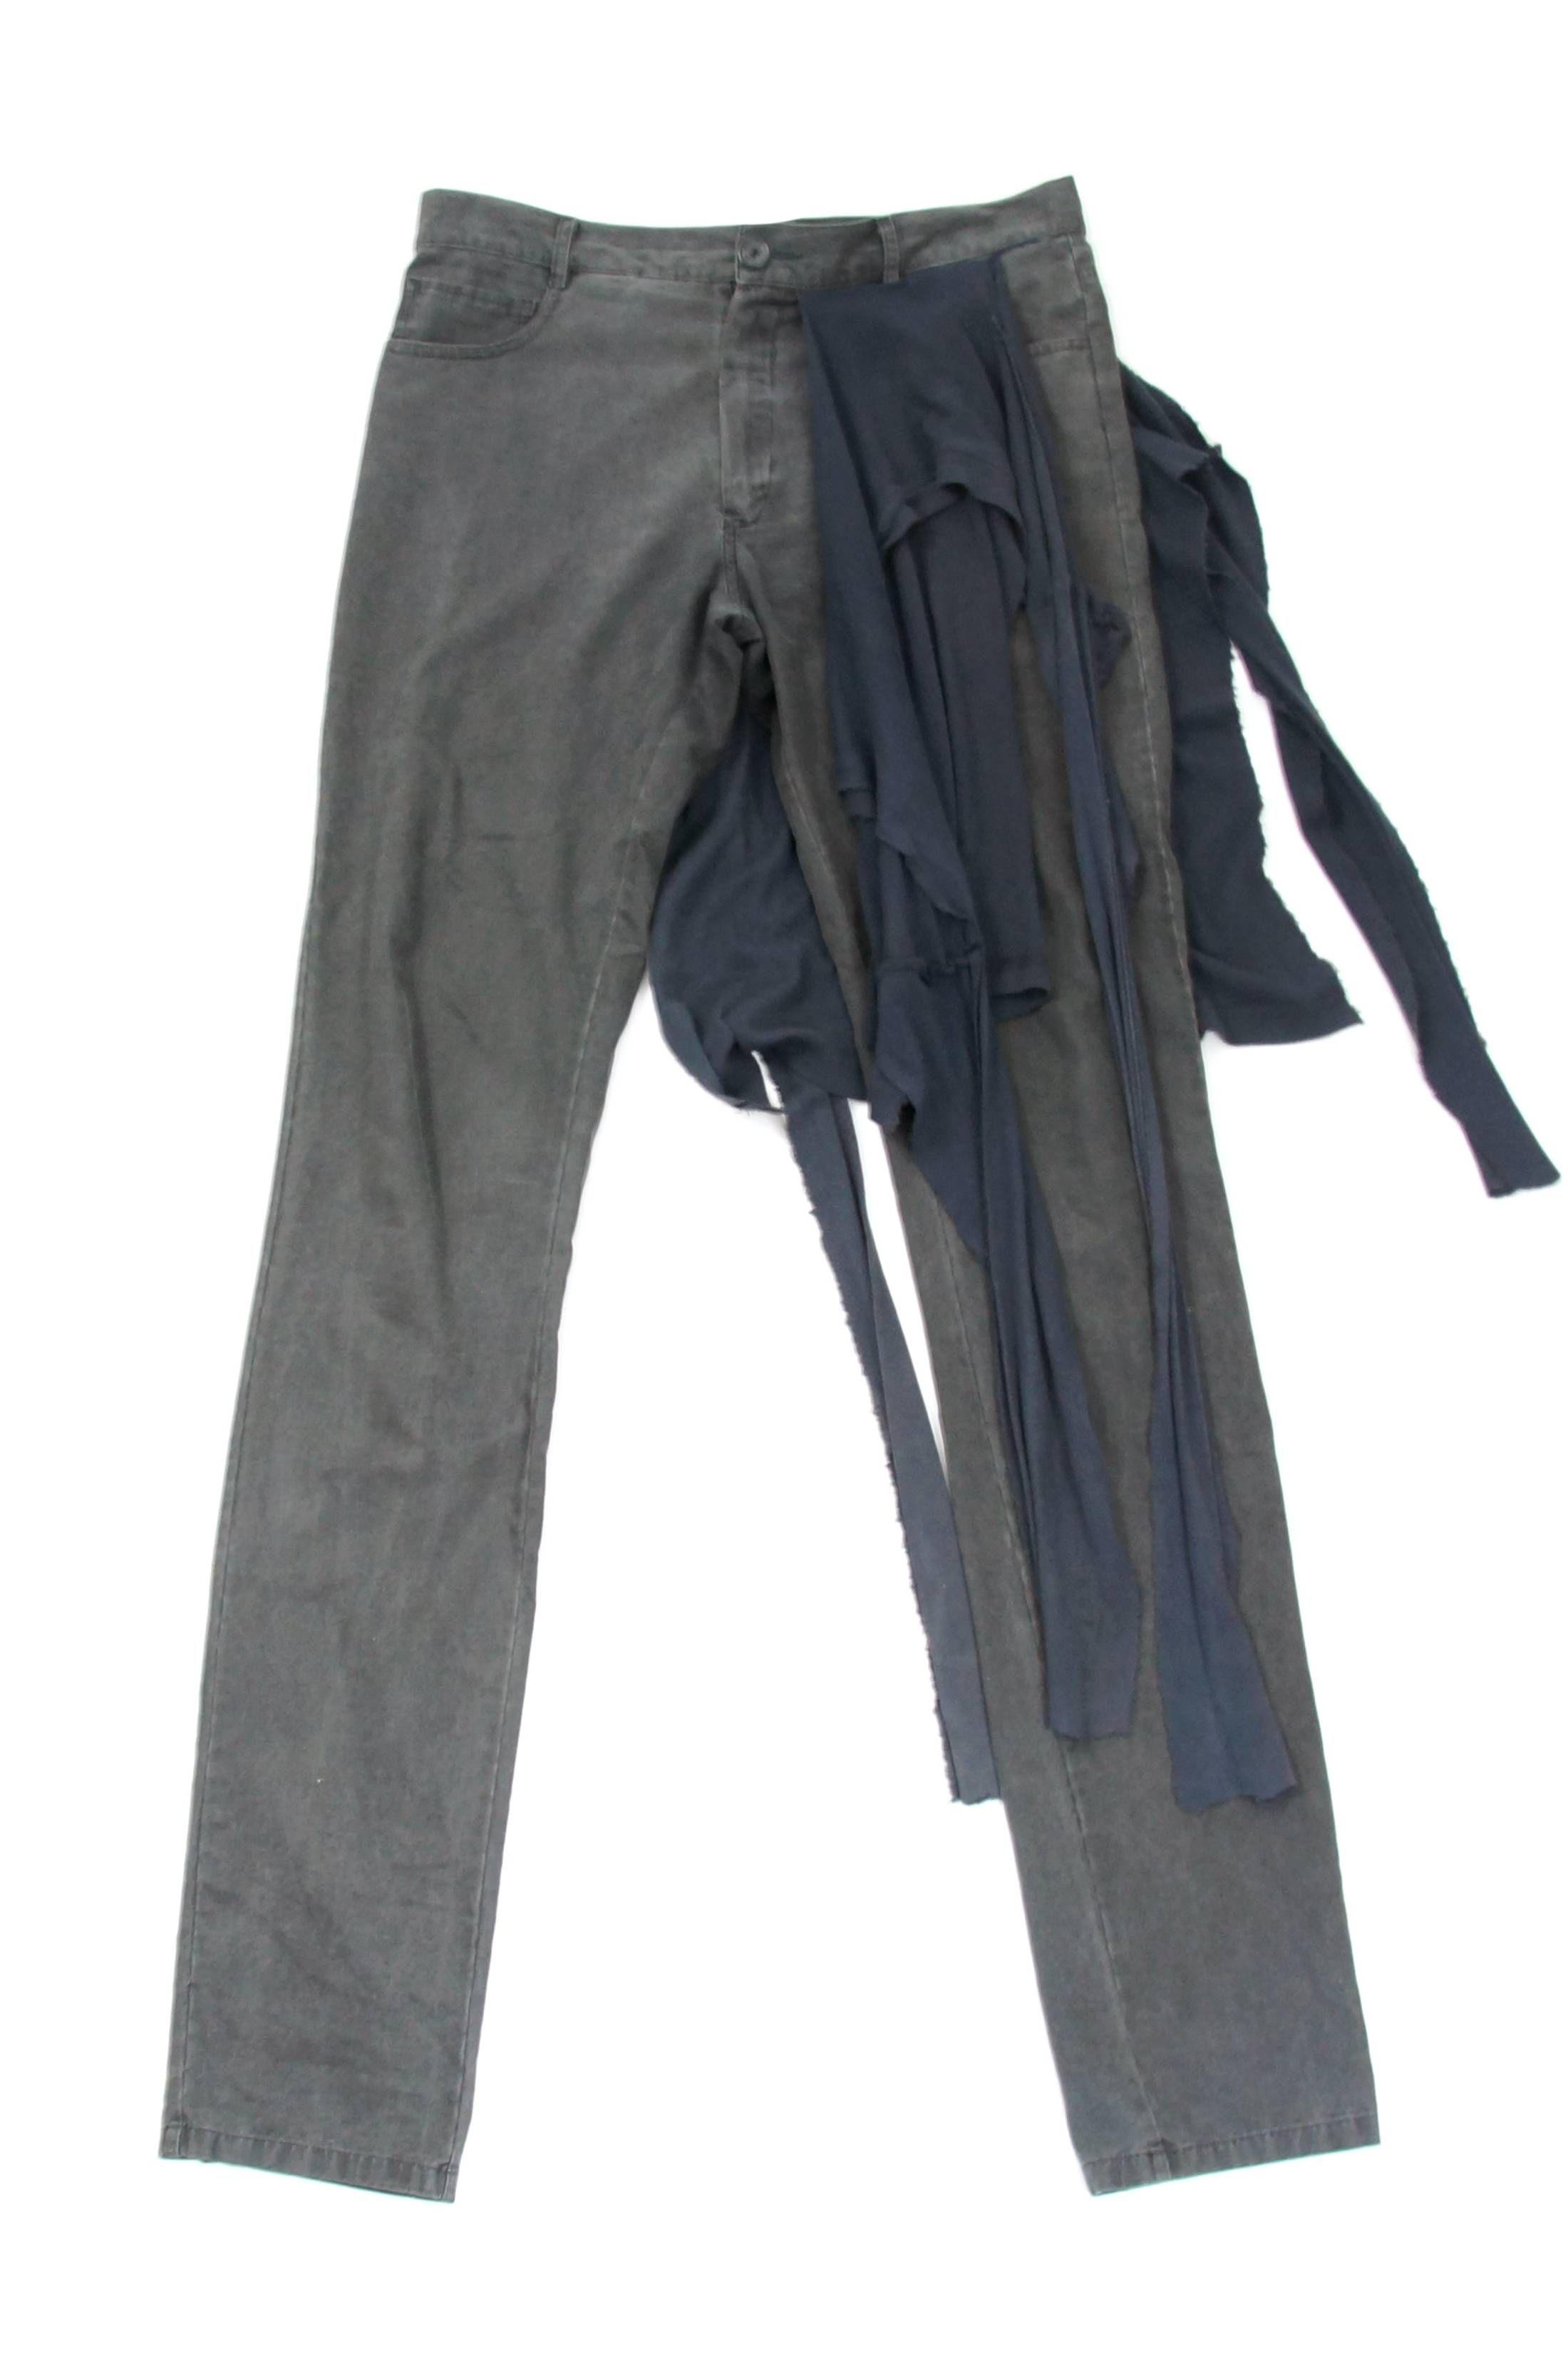 25144a0051 Raf Simons SS04 Zombie Pants